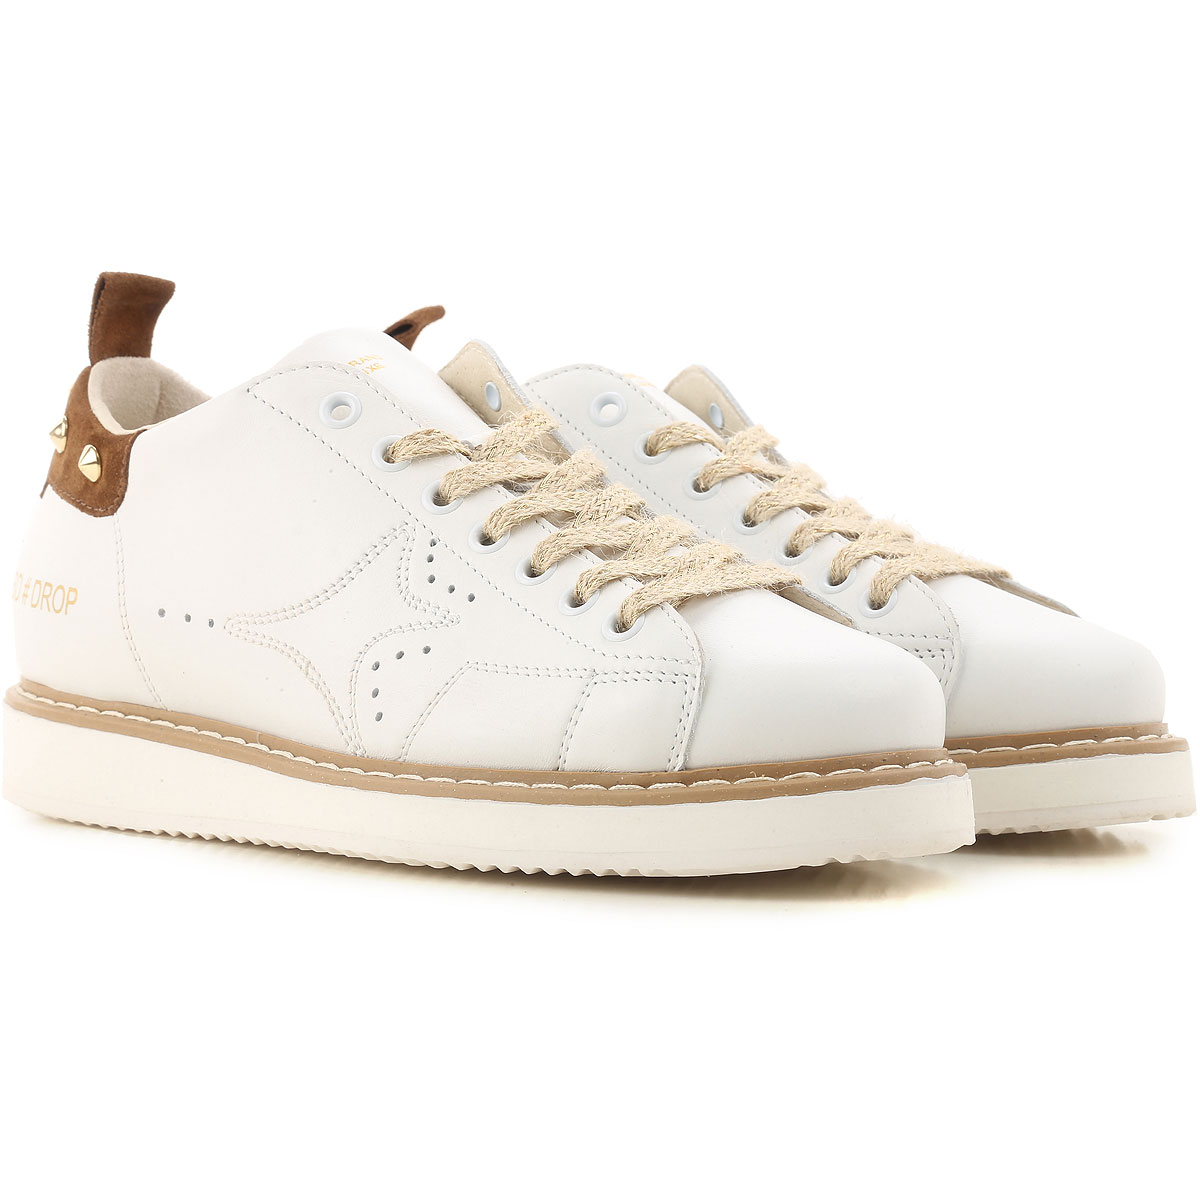 Image of Ama Brand Womens Shoes On Sale, White, Leather, 2017, EUR 36 - UK 3 - USA 5.5 EUR 40 - UK 7 - USA 9.5